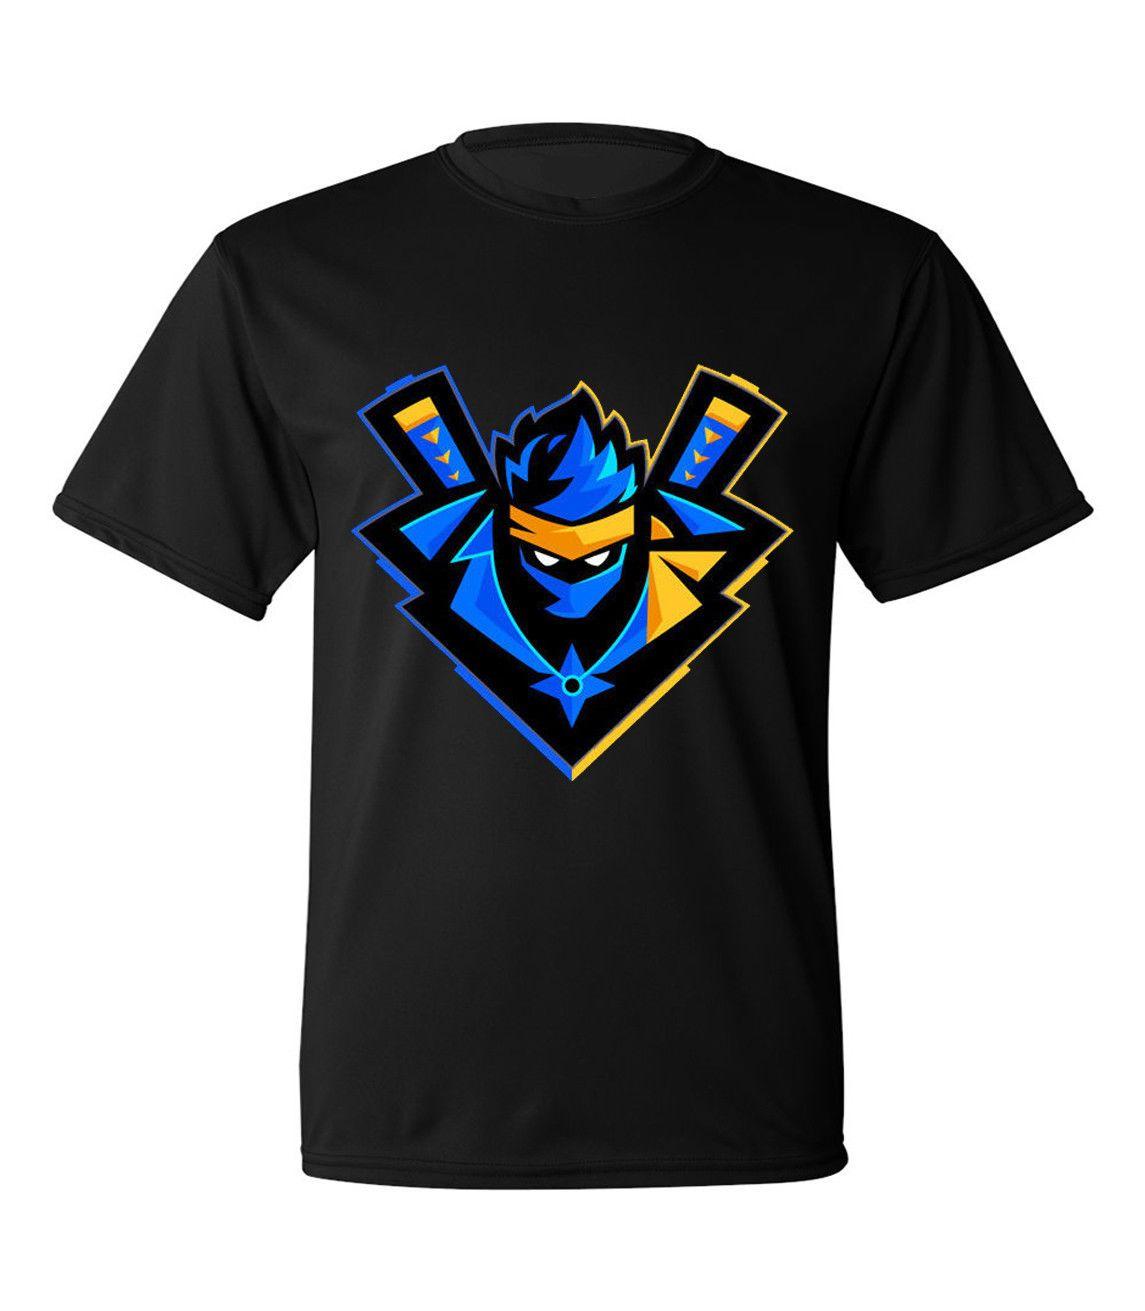 Grosshandel Fortnite Ninjashyper T Shirt Twitch Ninja Schlacht Royale